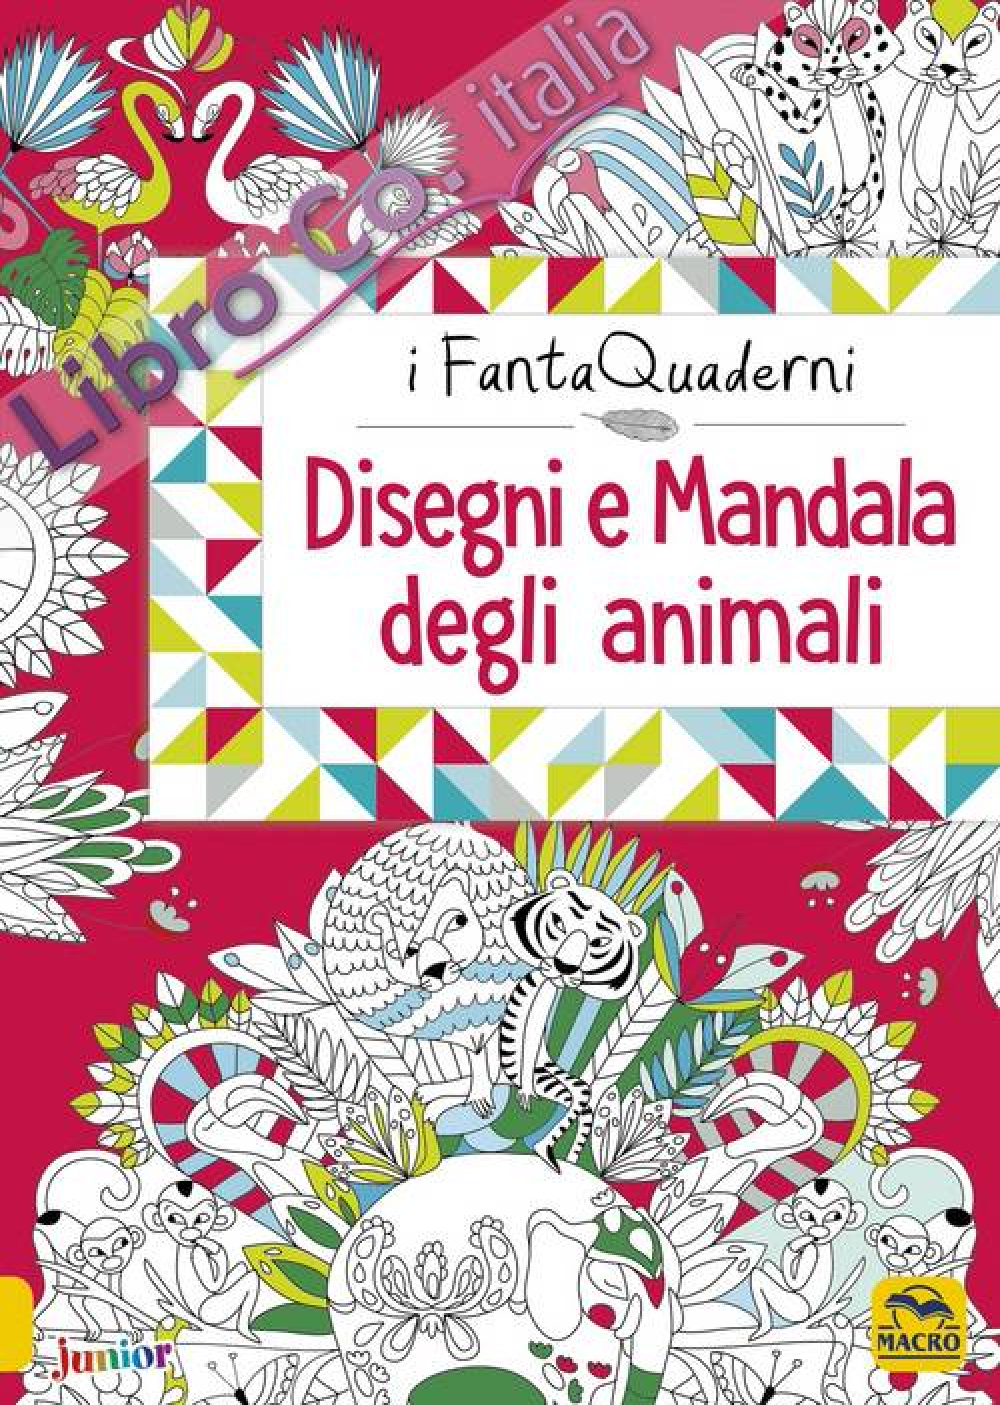 Disegni e mandala degli animali. I FantaQuaderni. Ediz. a colori